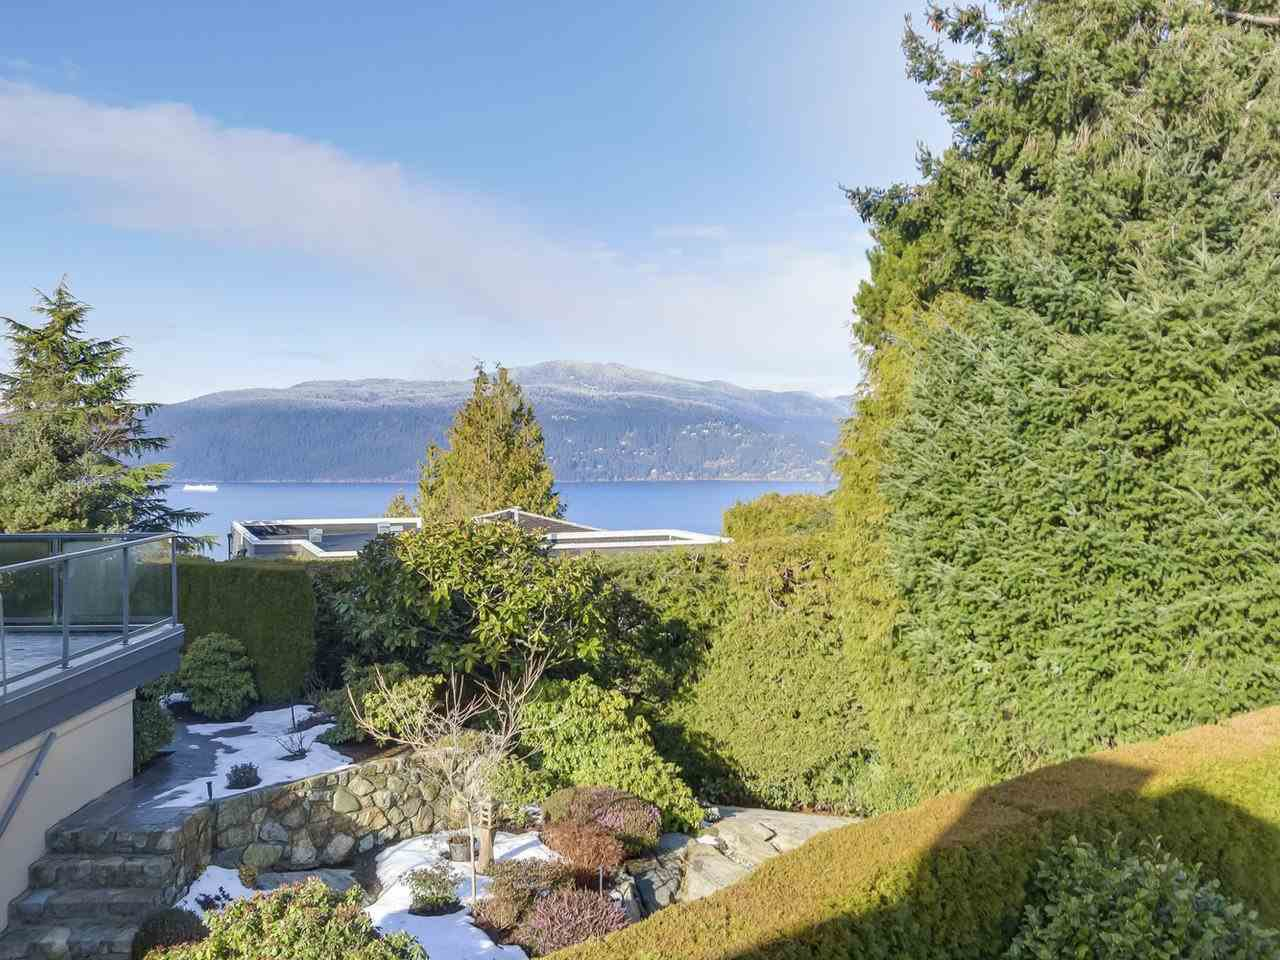 Photo 19: Photos: 5441 WEST VISTA COURT in West Vancouver: Upper Caulfeild House for sale : MLS®# R2341877